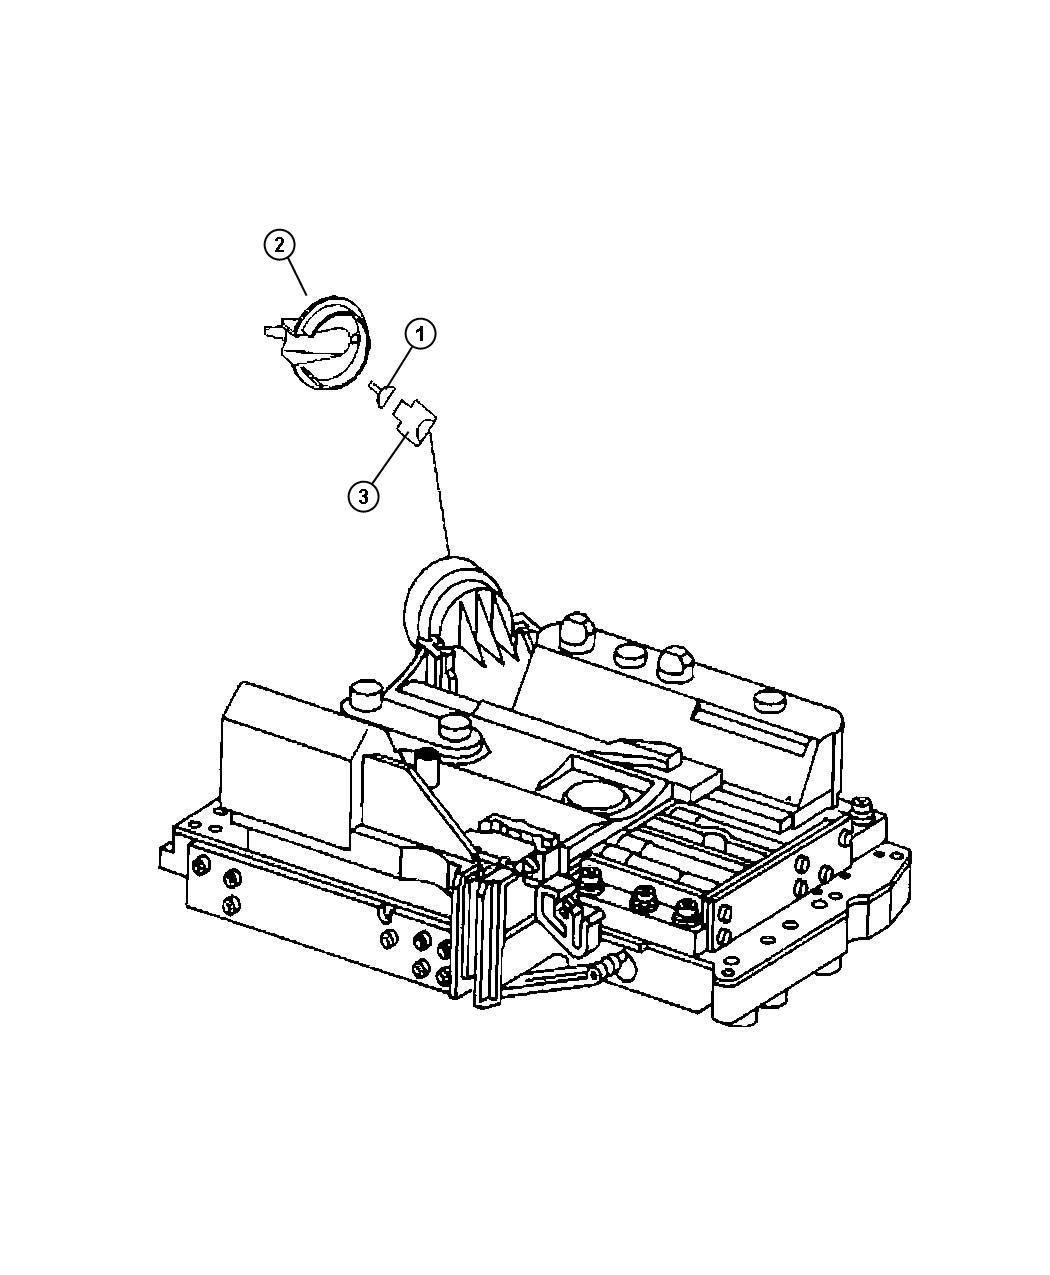 Dodge Nitro Connector  Case  Transmission  Valve